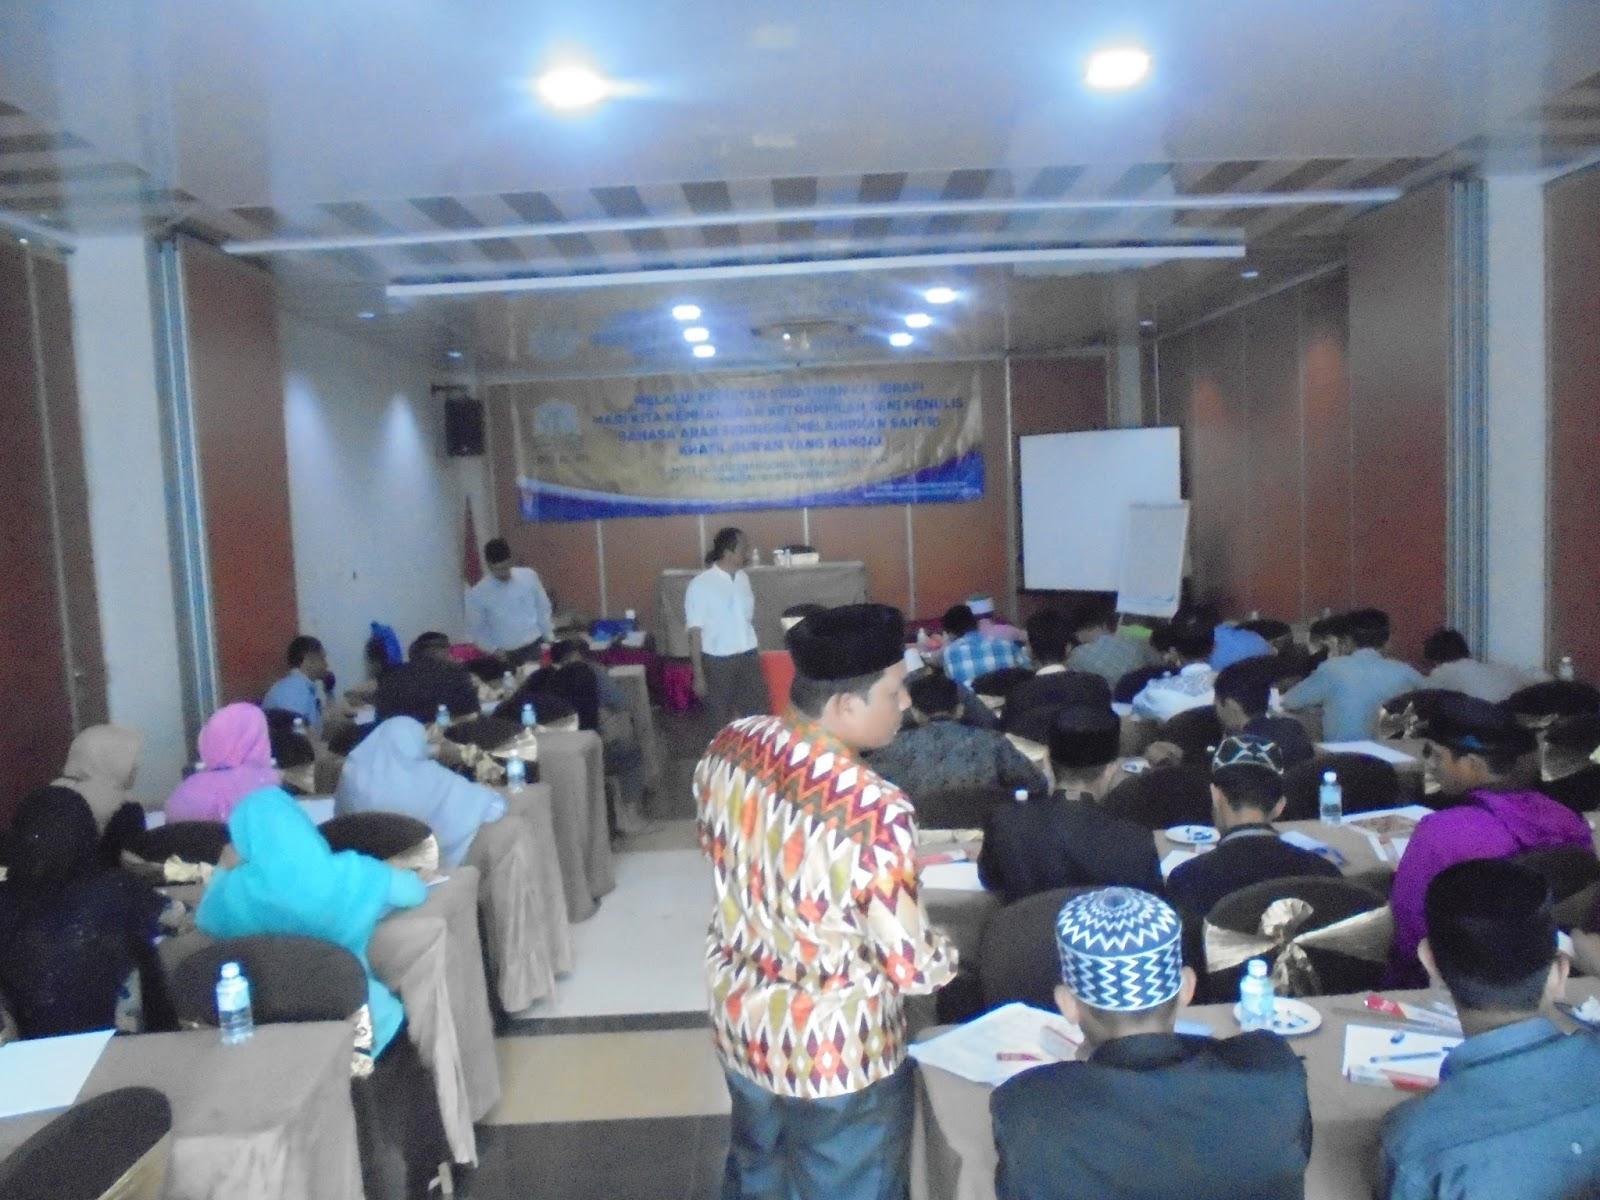 Banda Aceh BIN DICKY senin tanggal 01 05 05 2017 di Hotel Green Nangroe Banda Aceh Badan Pembinaan Pendidikan Dayah BPPD Provinsi Aceh mengadakan